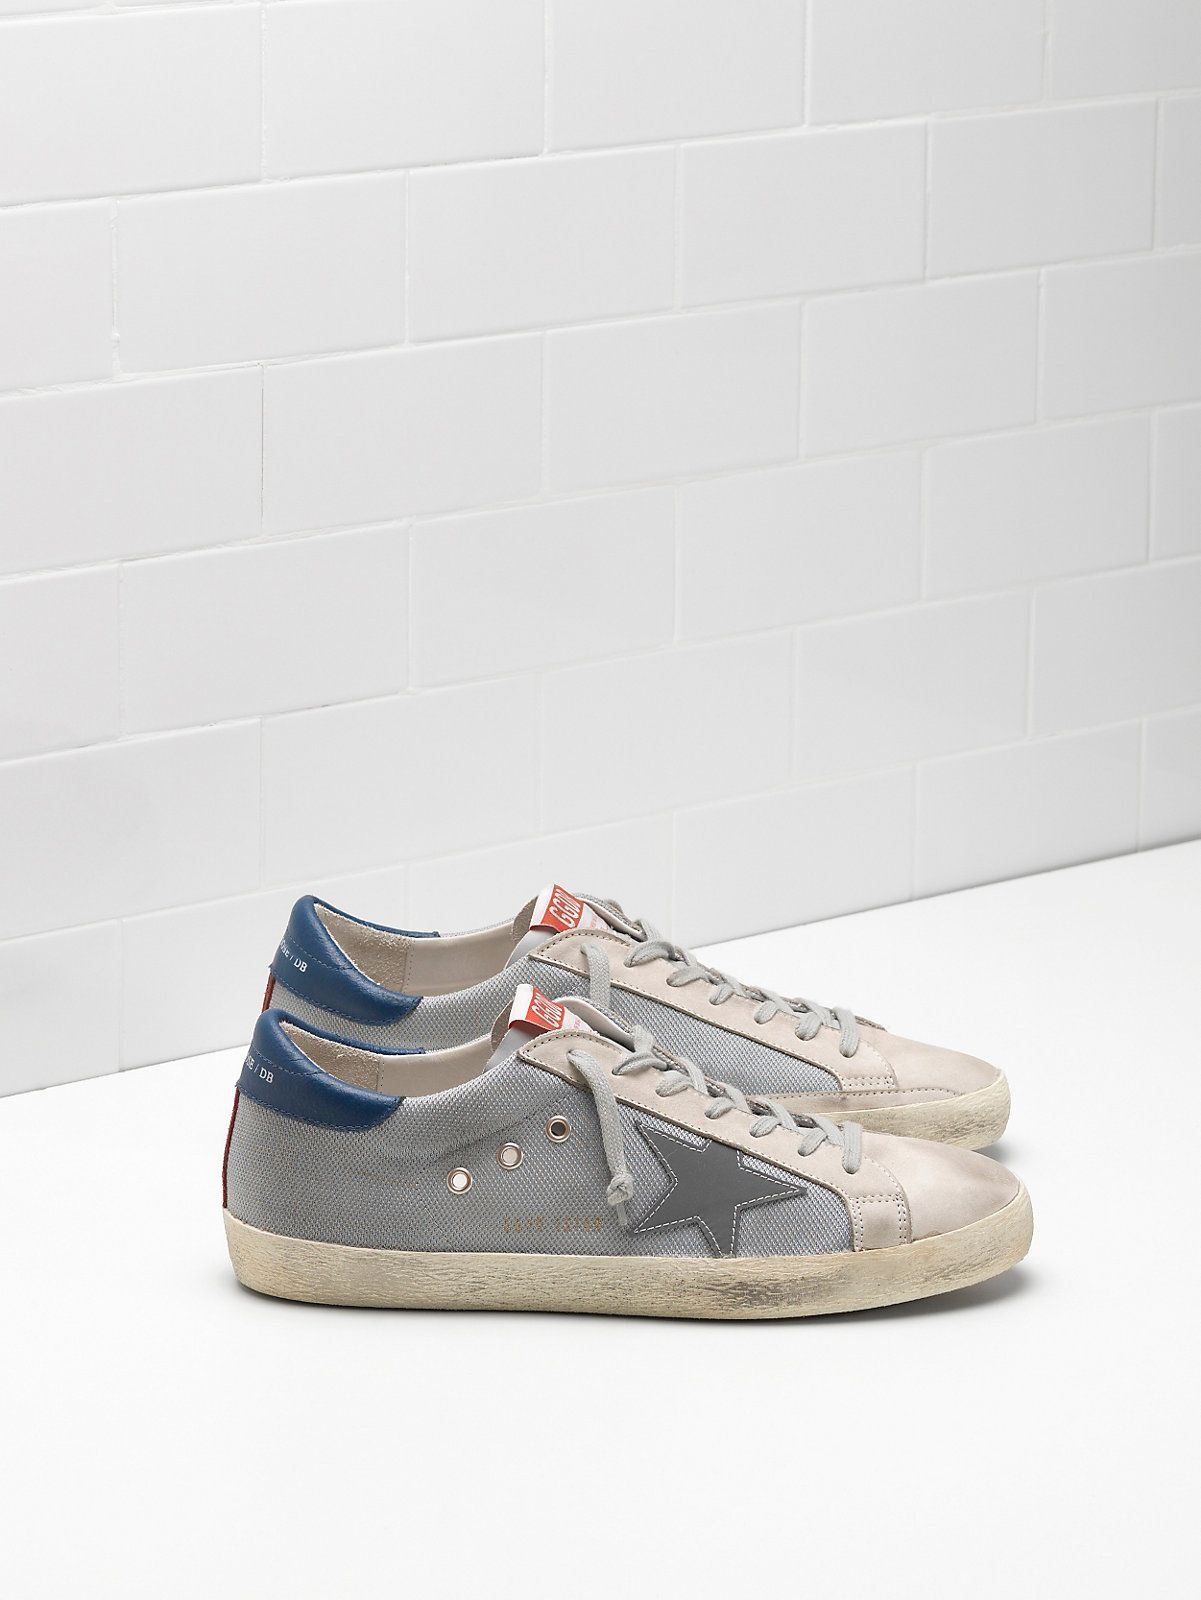 Golden goose sneakers, Sneaker outlet